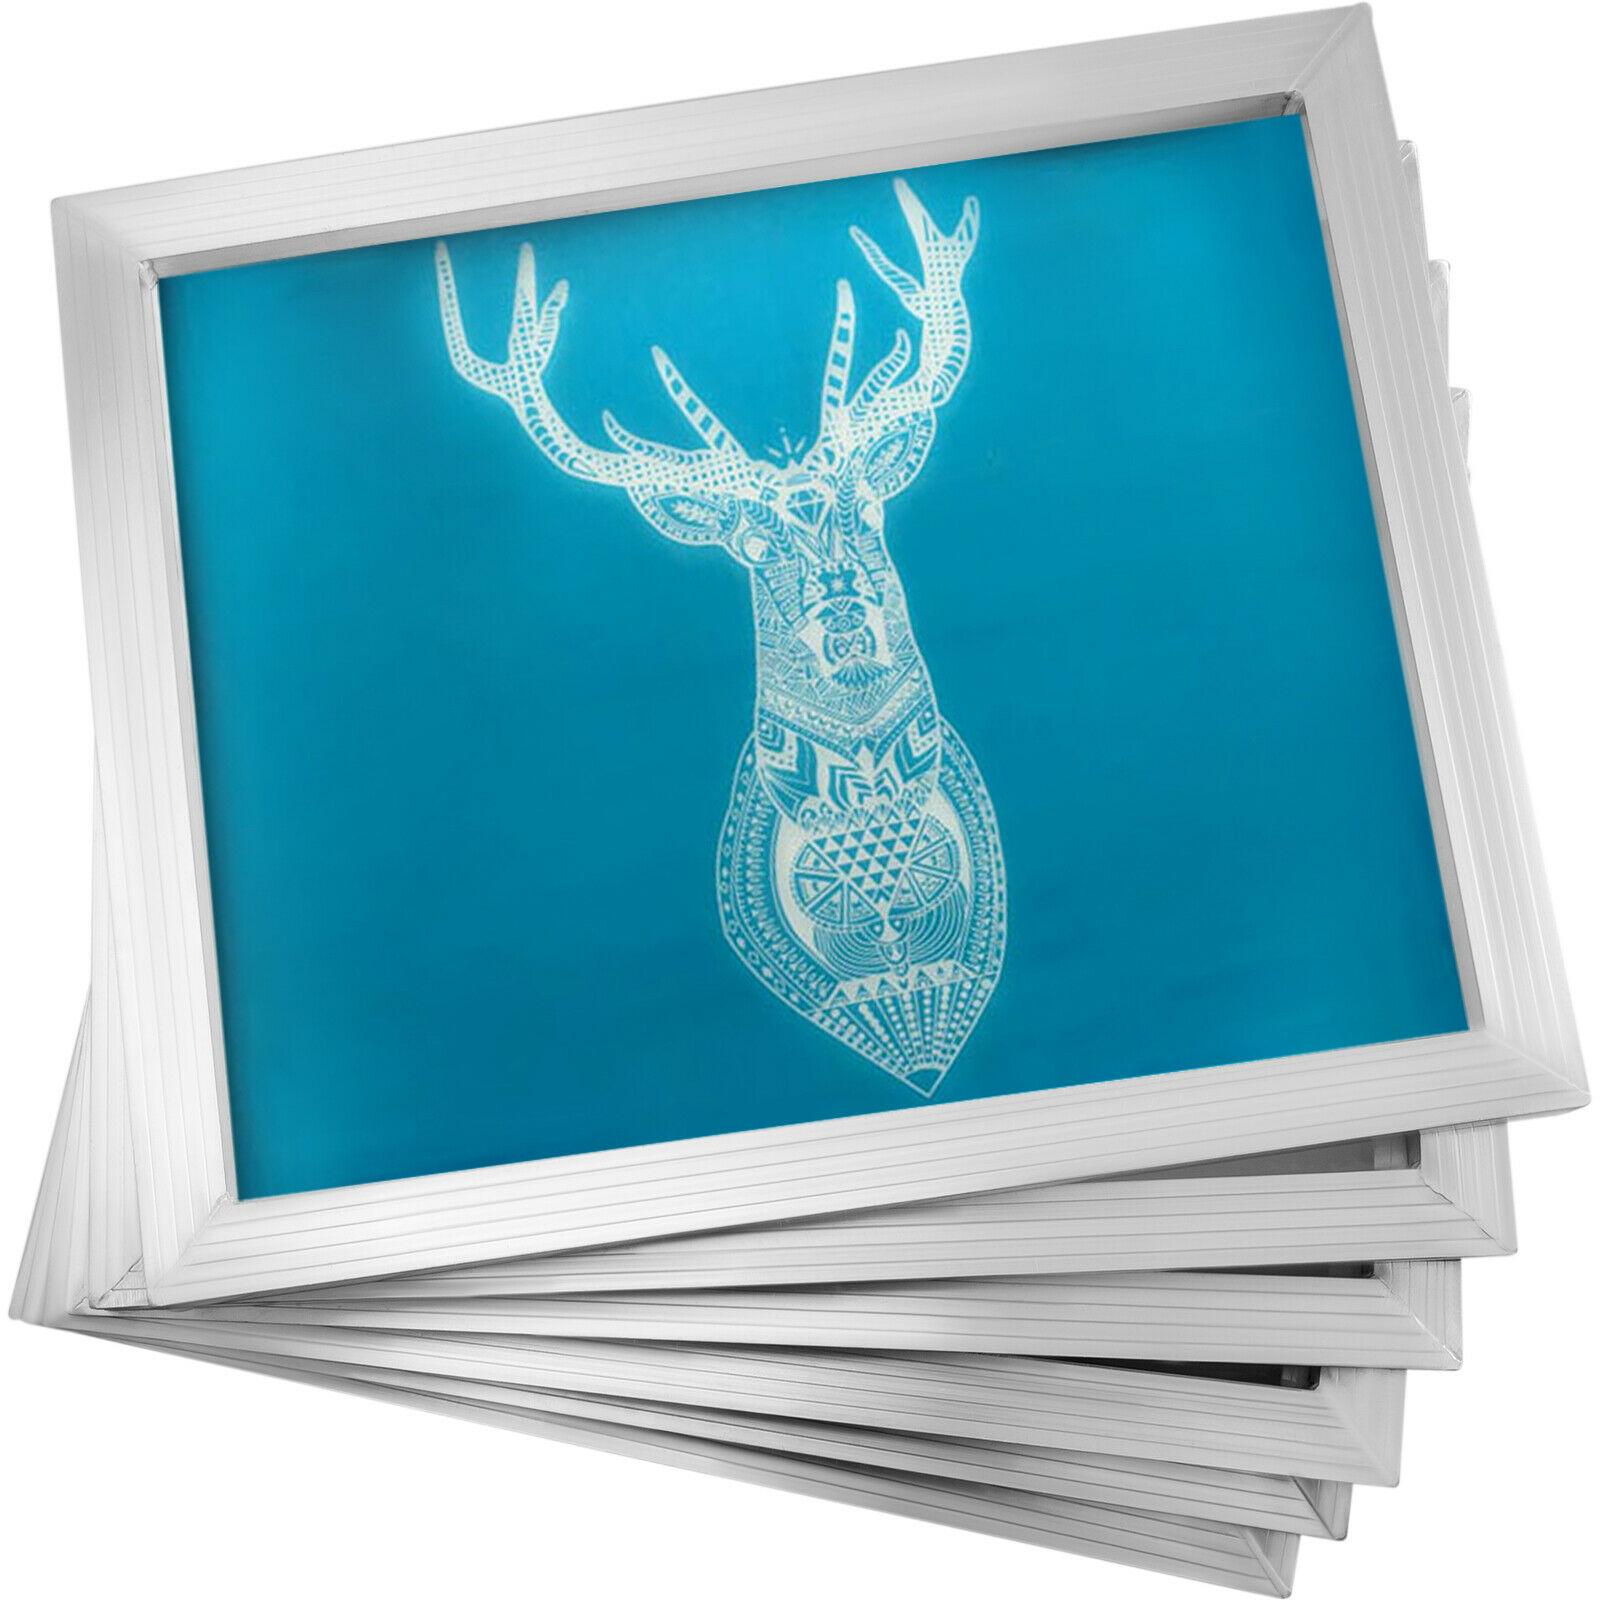 VEVOR إطار من الألومنيوم طباعة الشاشة الحريرية 6 قطع أبيض مختلف شبكة الحبر الضغط التسامي مناسبة لآلة أو دليل